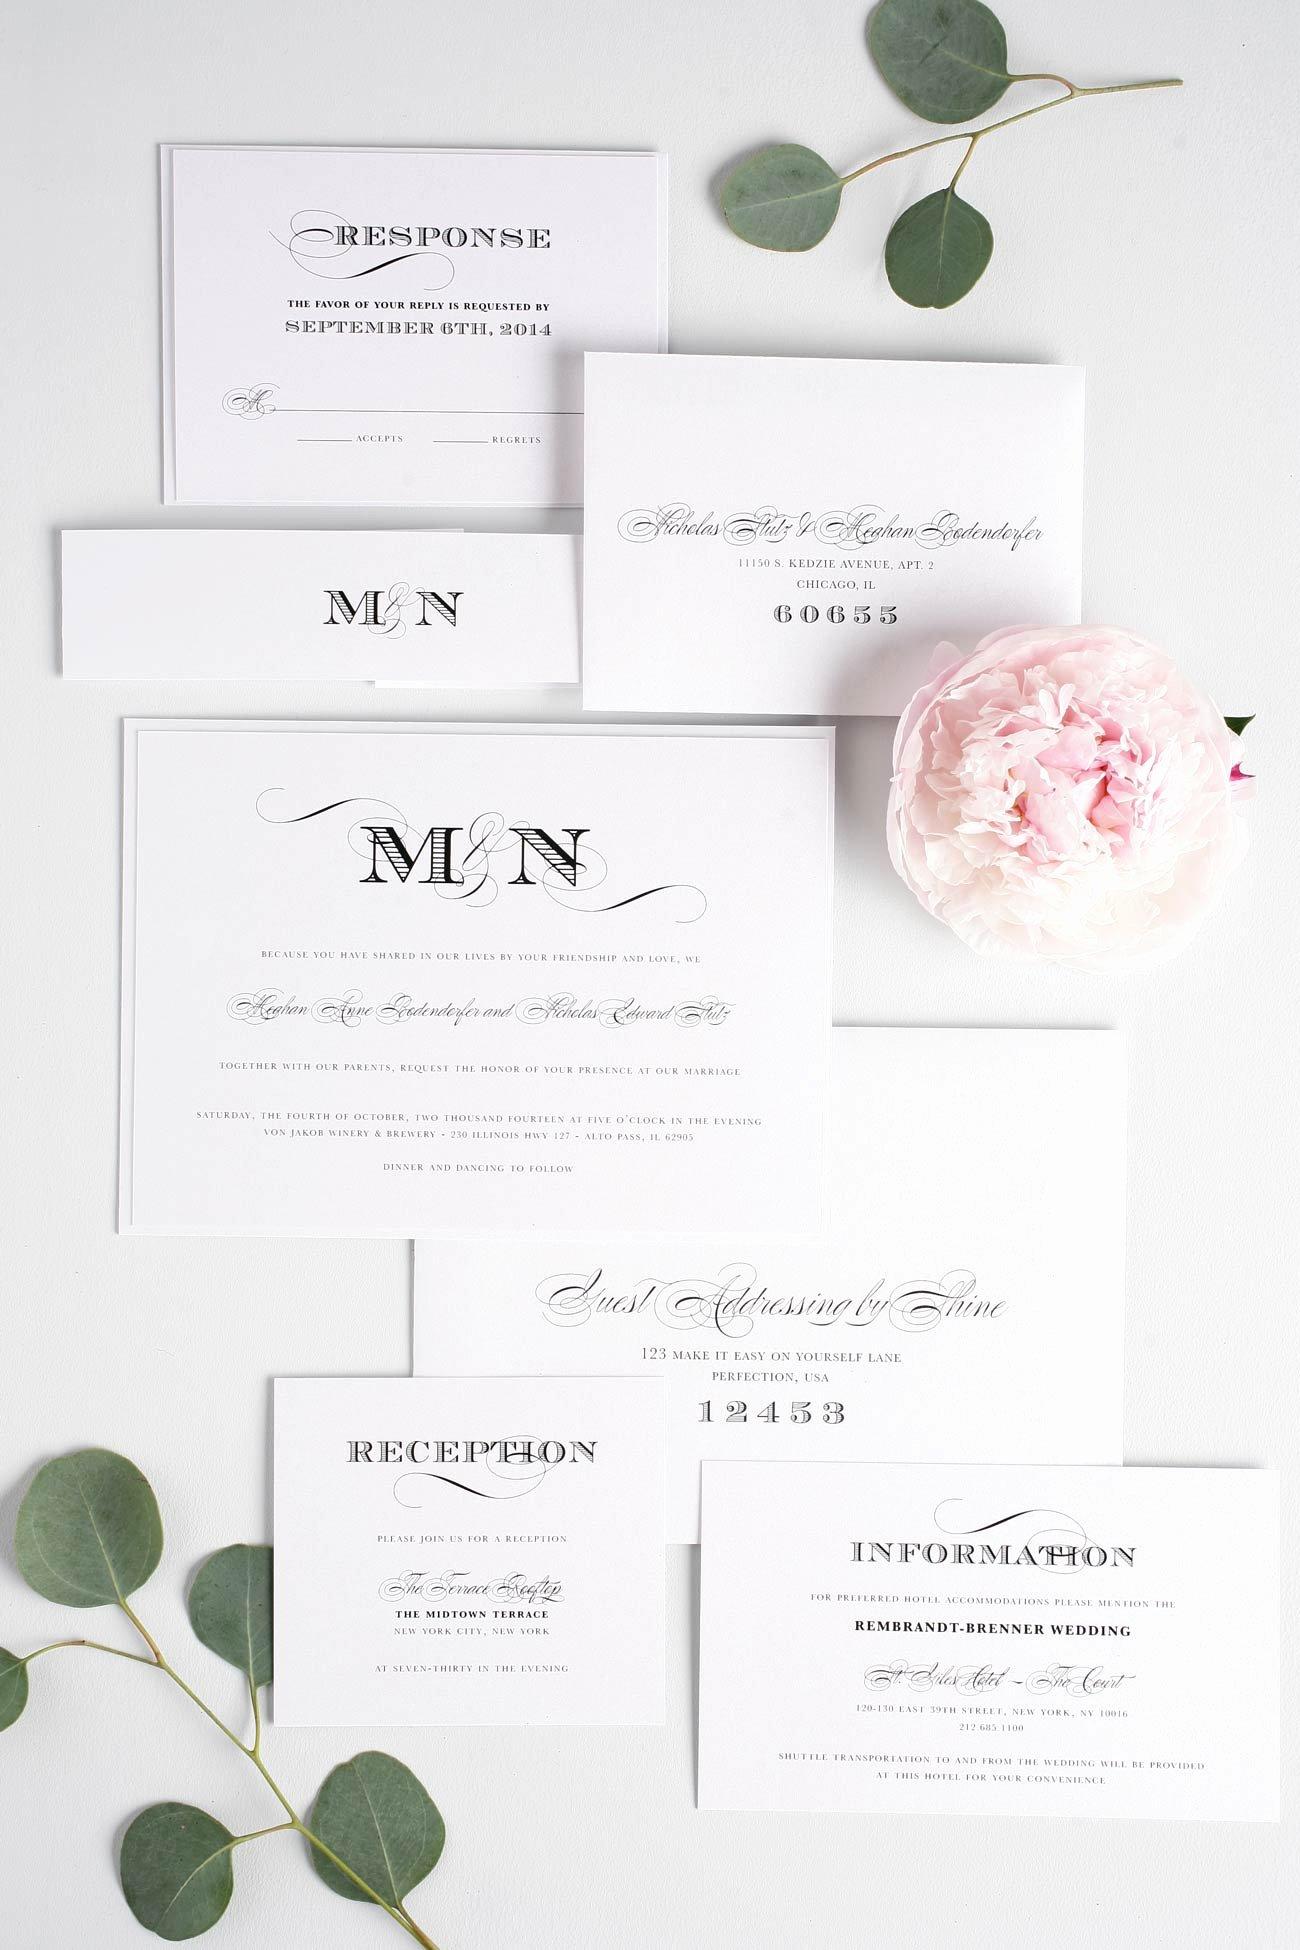 Black and White Invitations Beautiful ornate Elegant Wedding Invitations In Black and White – Wedding Invitations